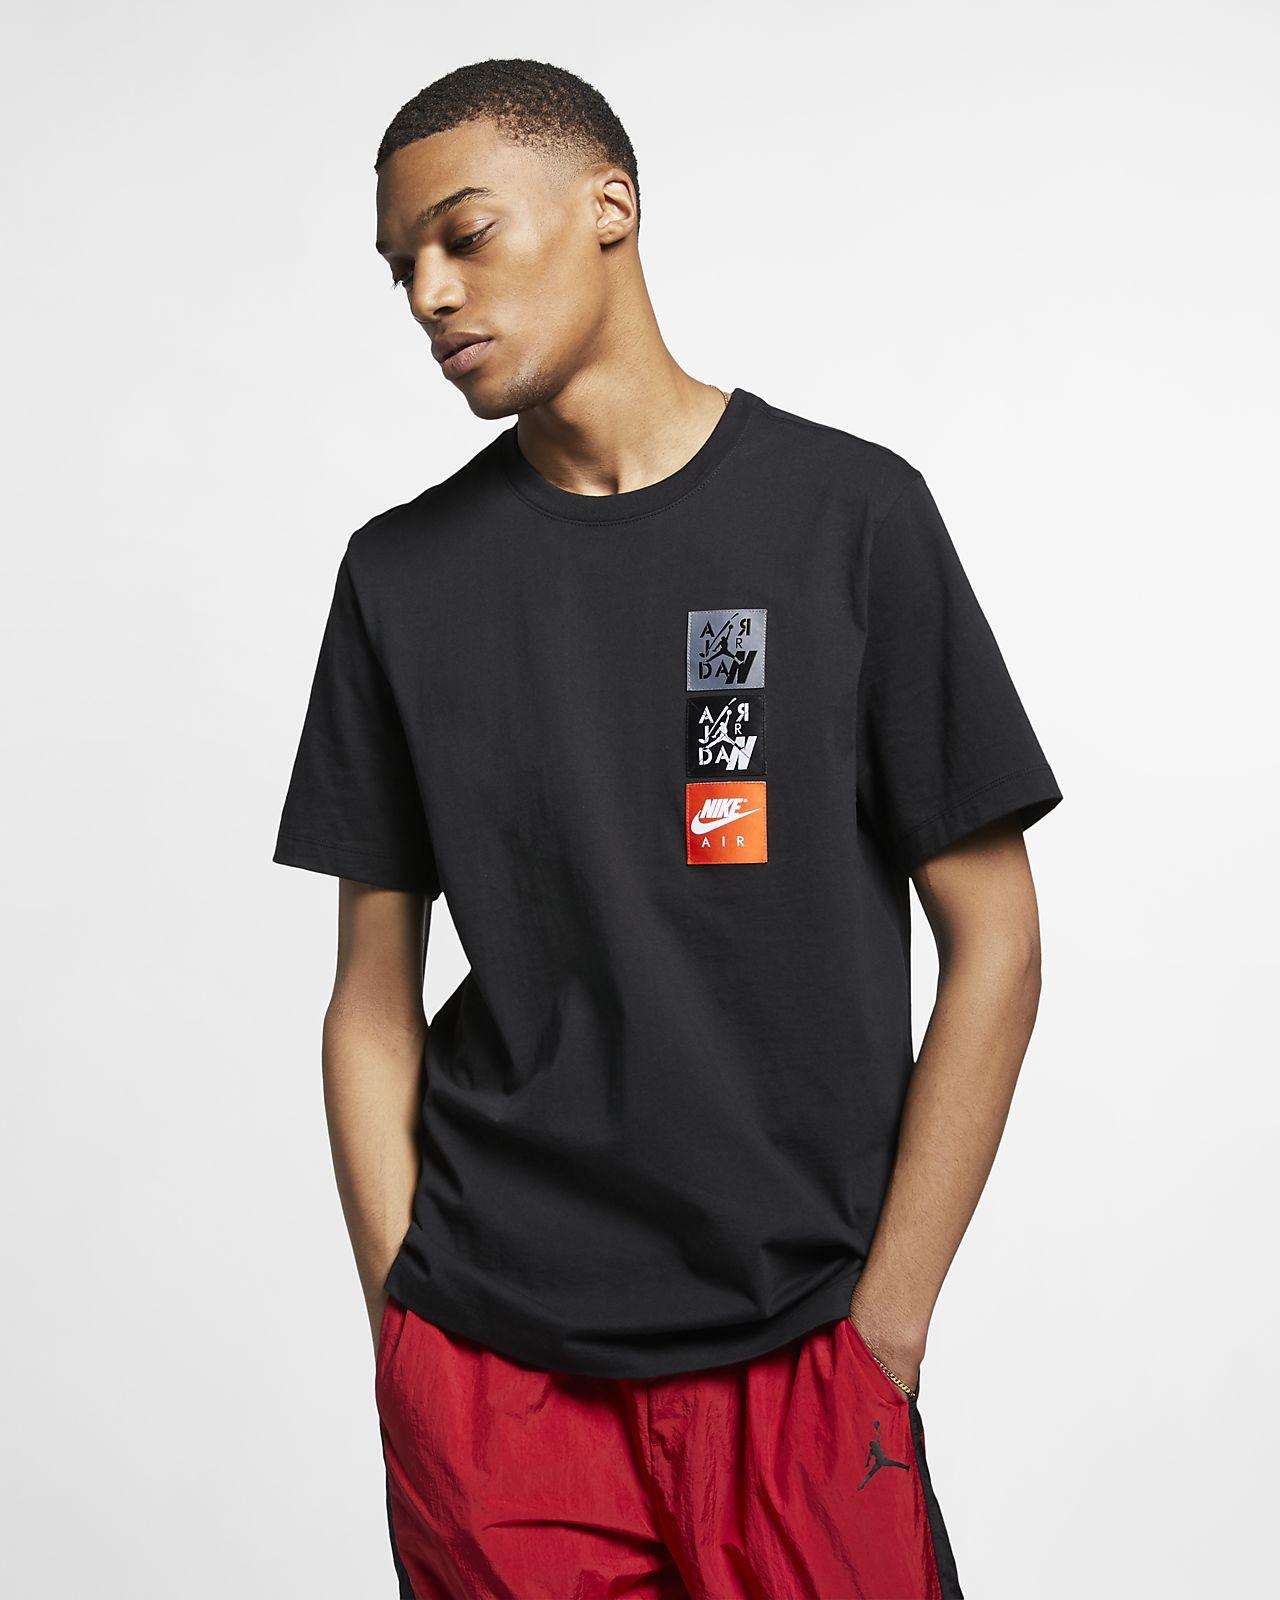 ec320fbdd05 Jordan Legacy AJ4 Woven Labels Men's T-Shirt. Nike.com IN